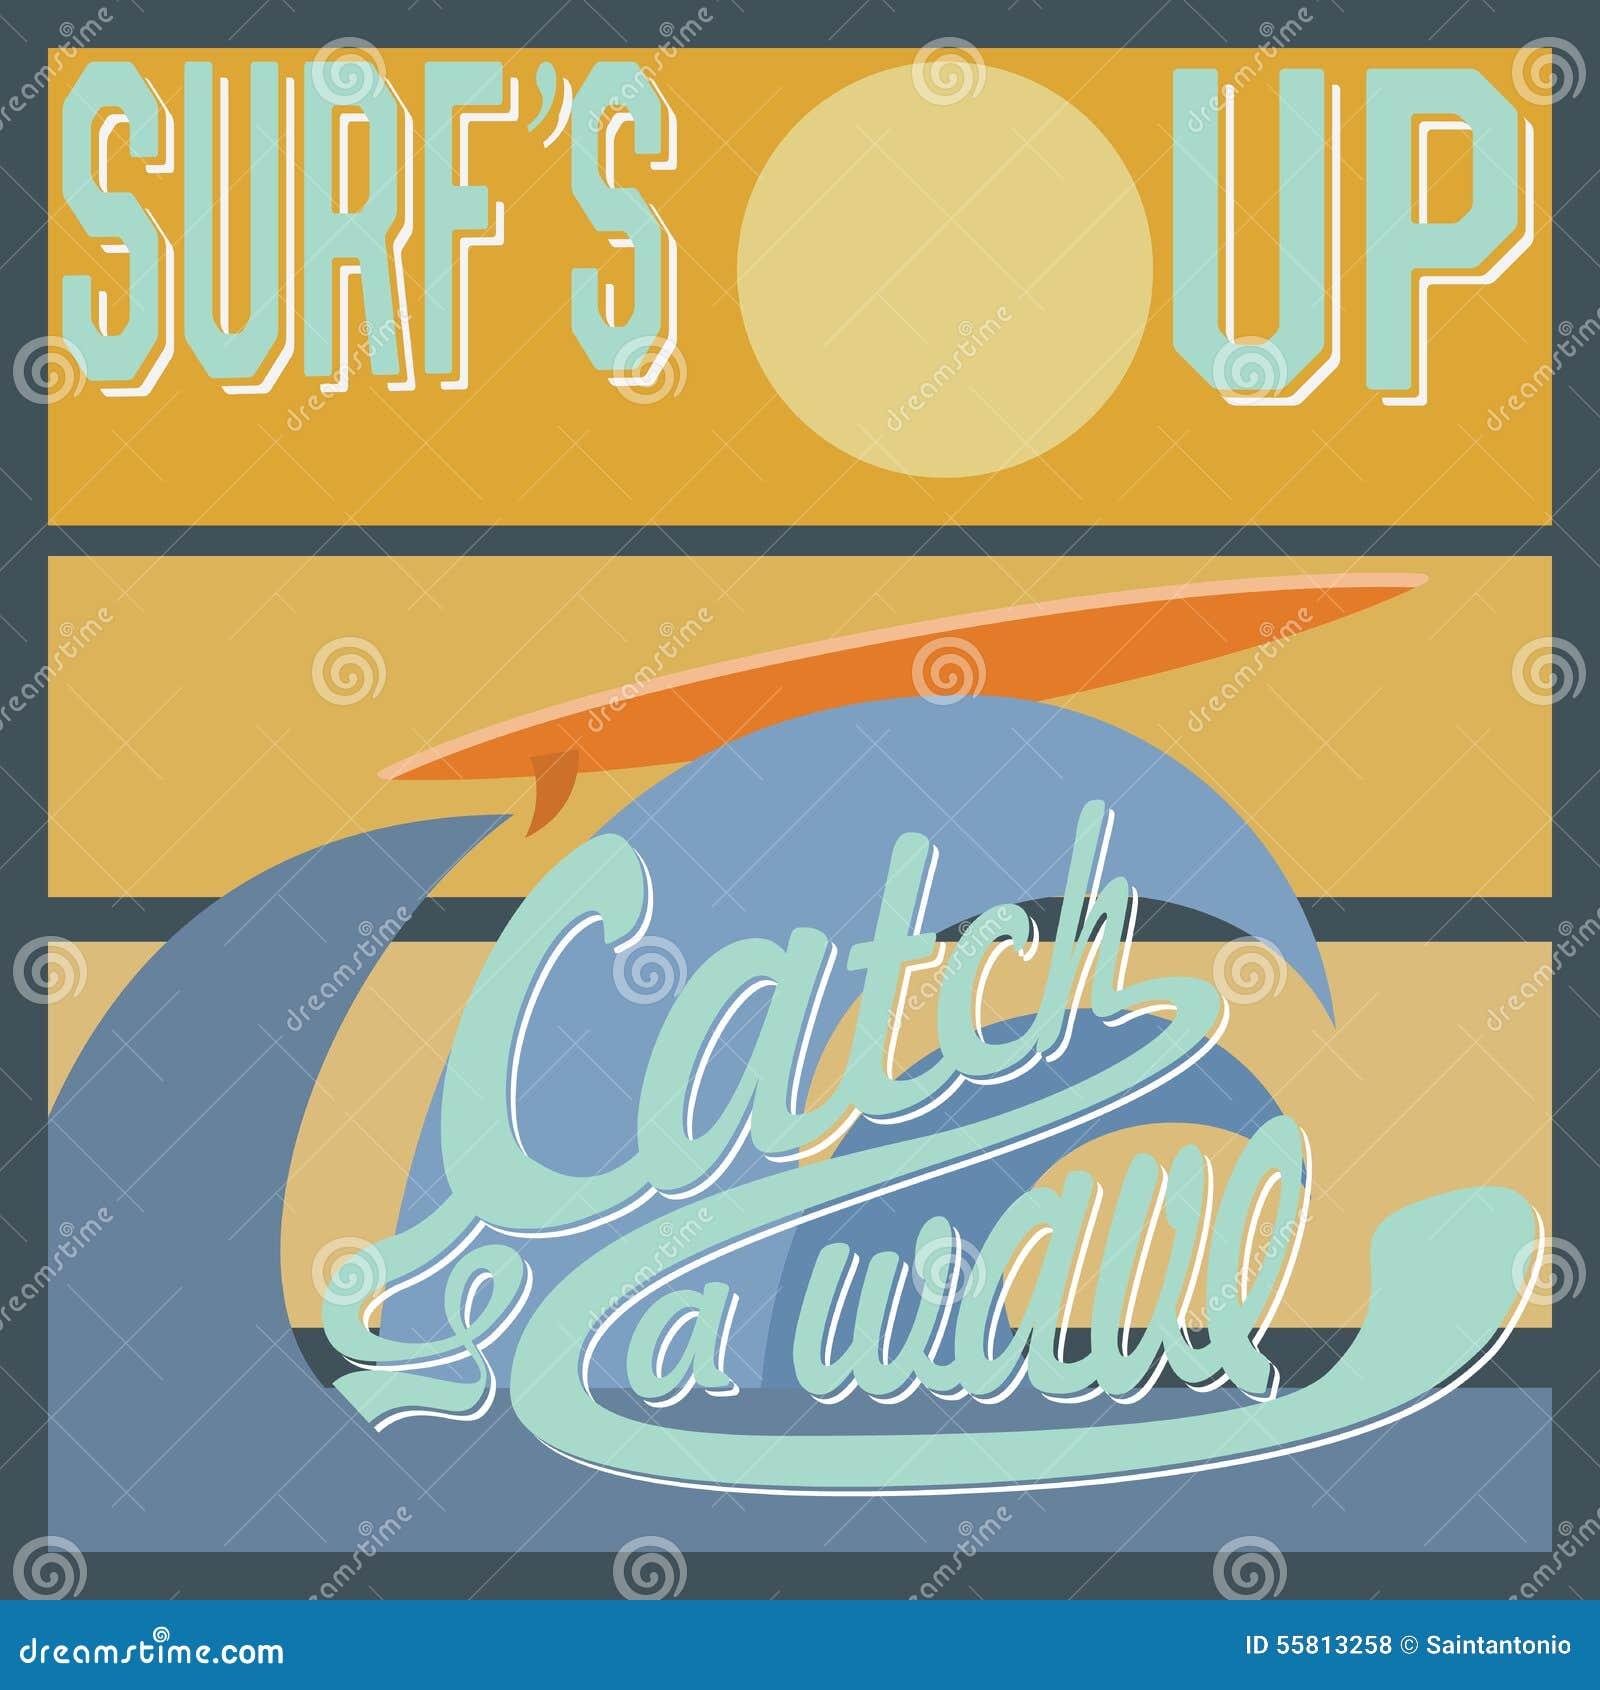 Shirt design san diego - Surf S Up Typography T Shirt Printing Design Graphics Retro Vintage Vector Poster